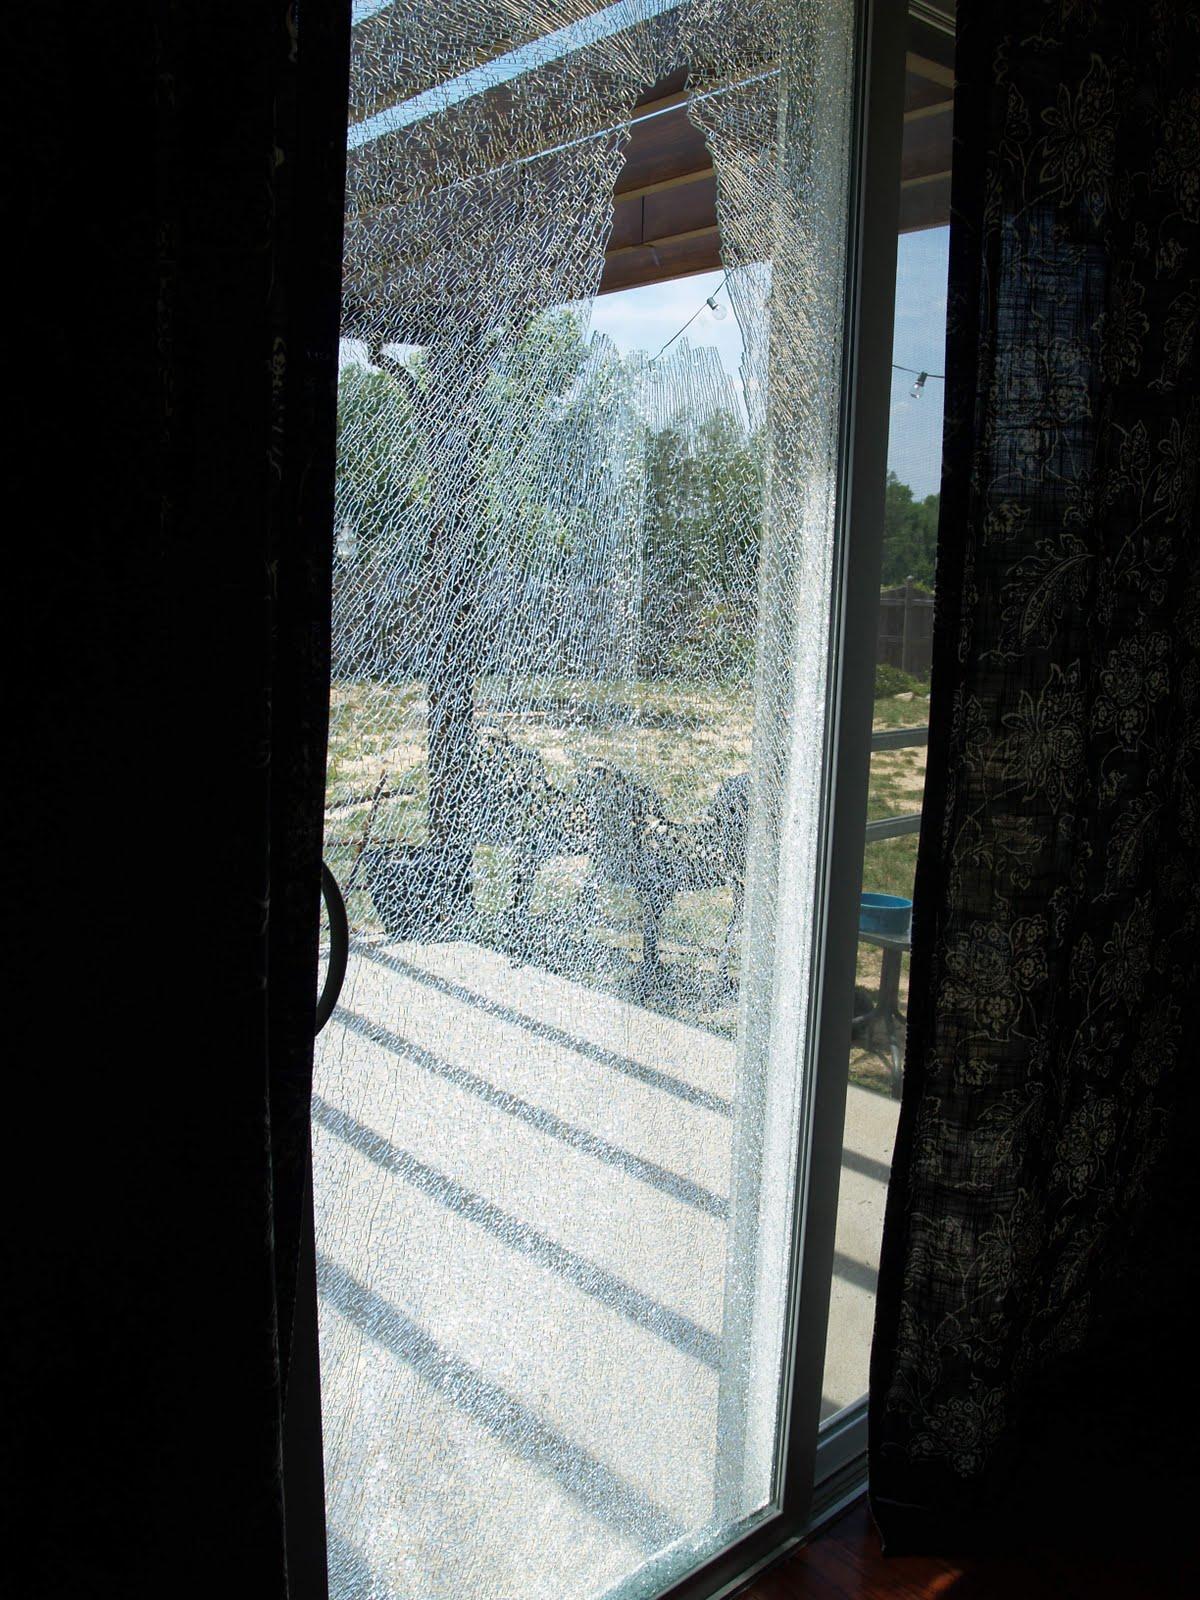 Terrific sliding glass door glass shattered photos exterior ideas sliding glass door glass shattered planetlyrics Gallery